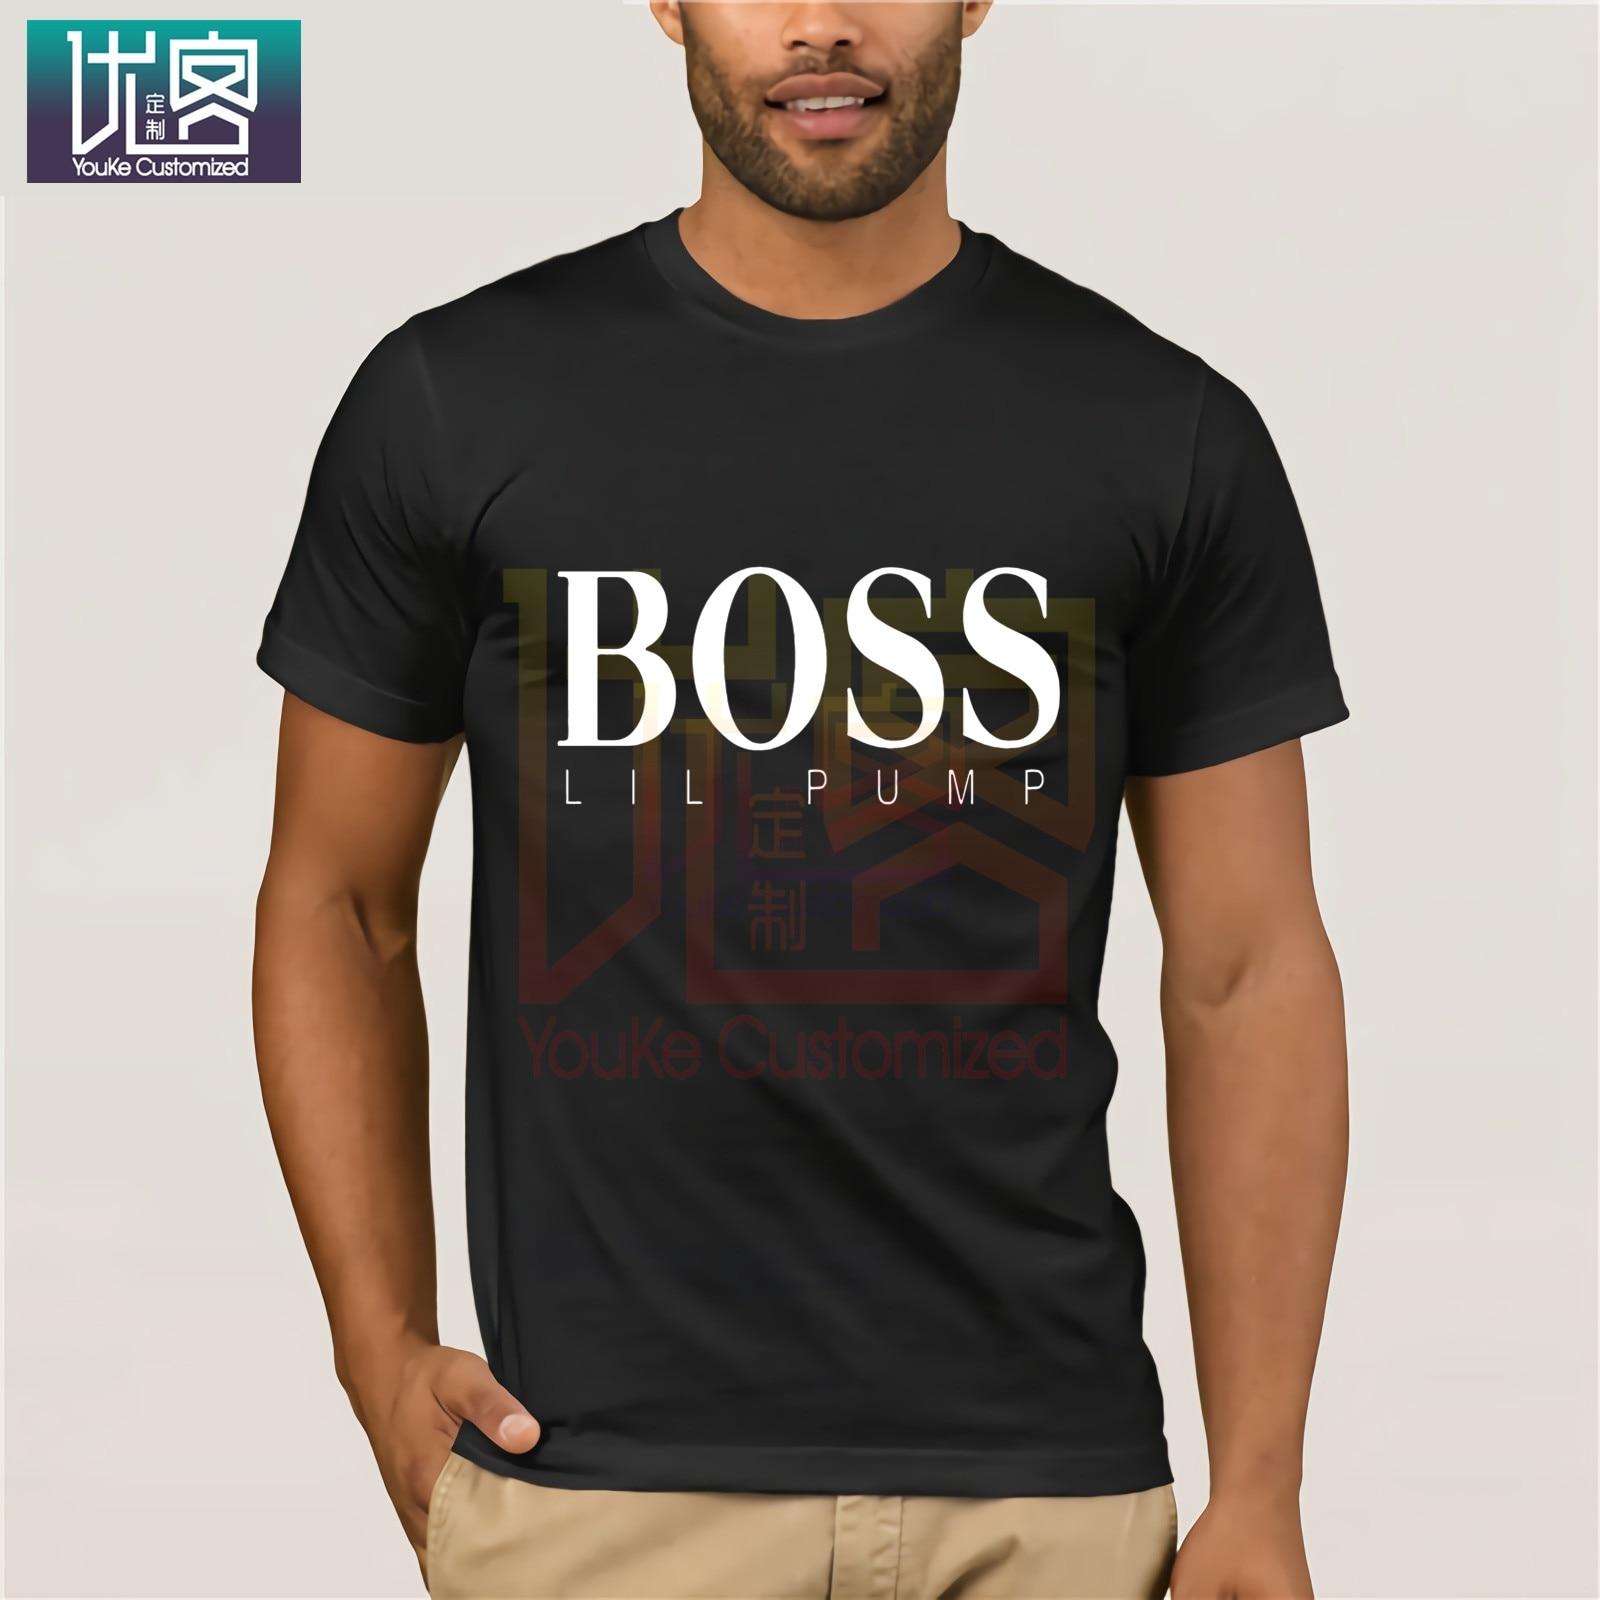 Men Casual Tee Shirts Boss Hip Hop Lil Pump Designer T Shirt Man Cotton Short Sleeve Tee Shirts Leisure Men Good Design Tshirts